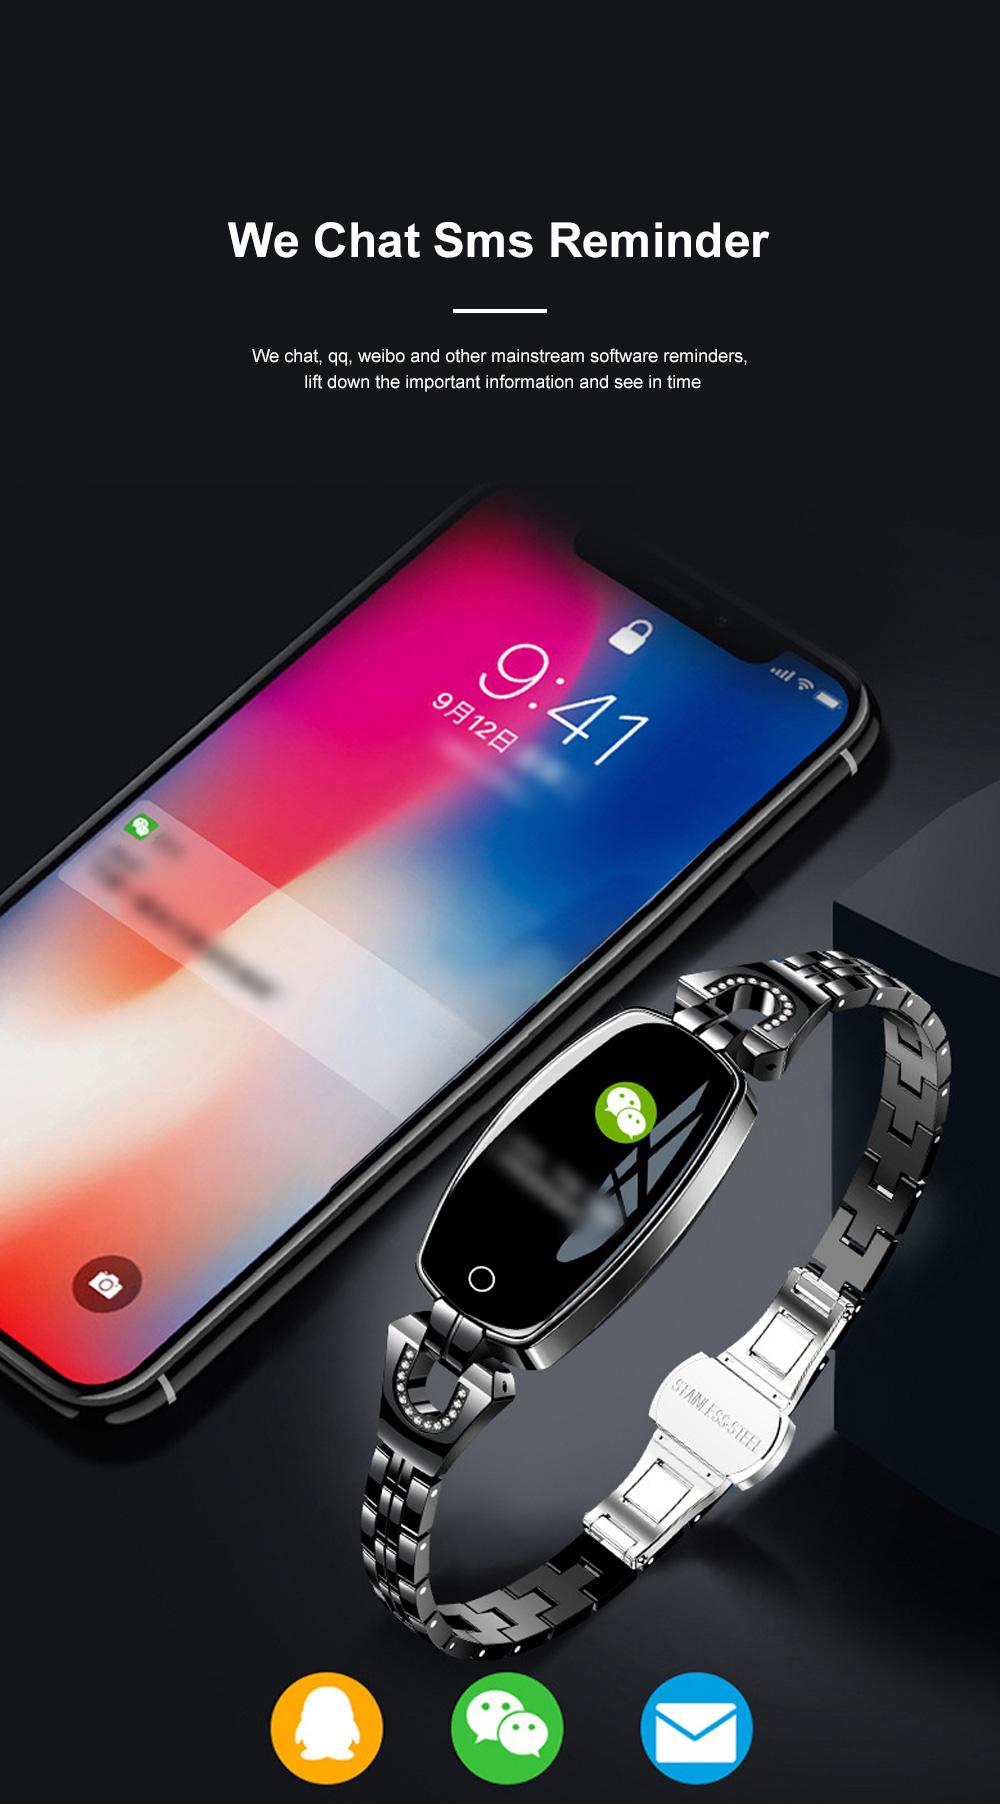 2019 Women Lady Fashion Smart Wristband H8 Heart Rate Blood Pressure Smart Bracelet Fitness Tracker Smart Watch Band Female Girl Gift 6